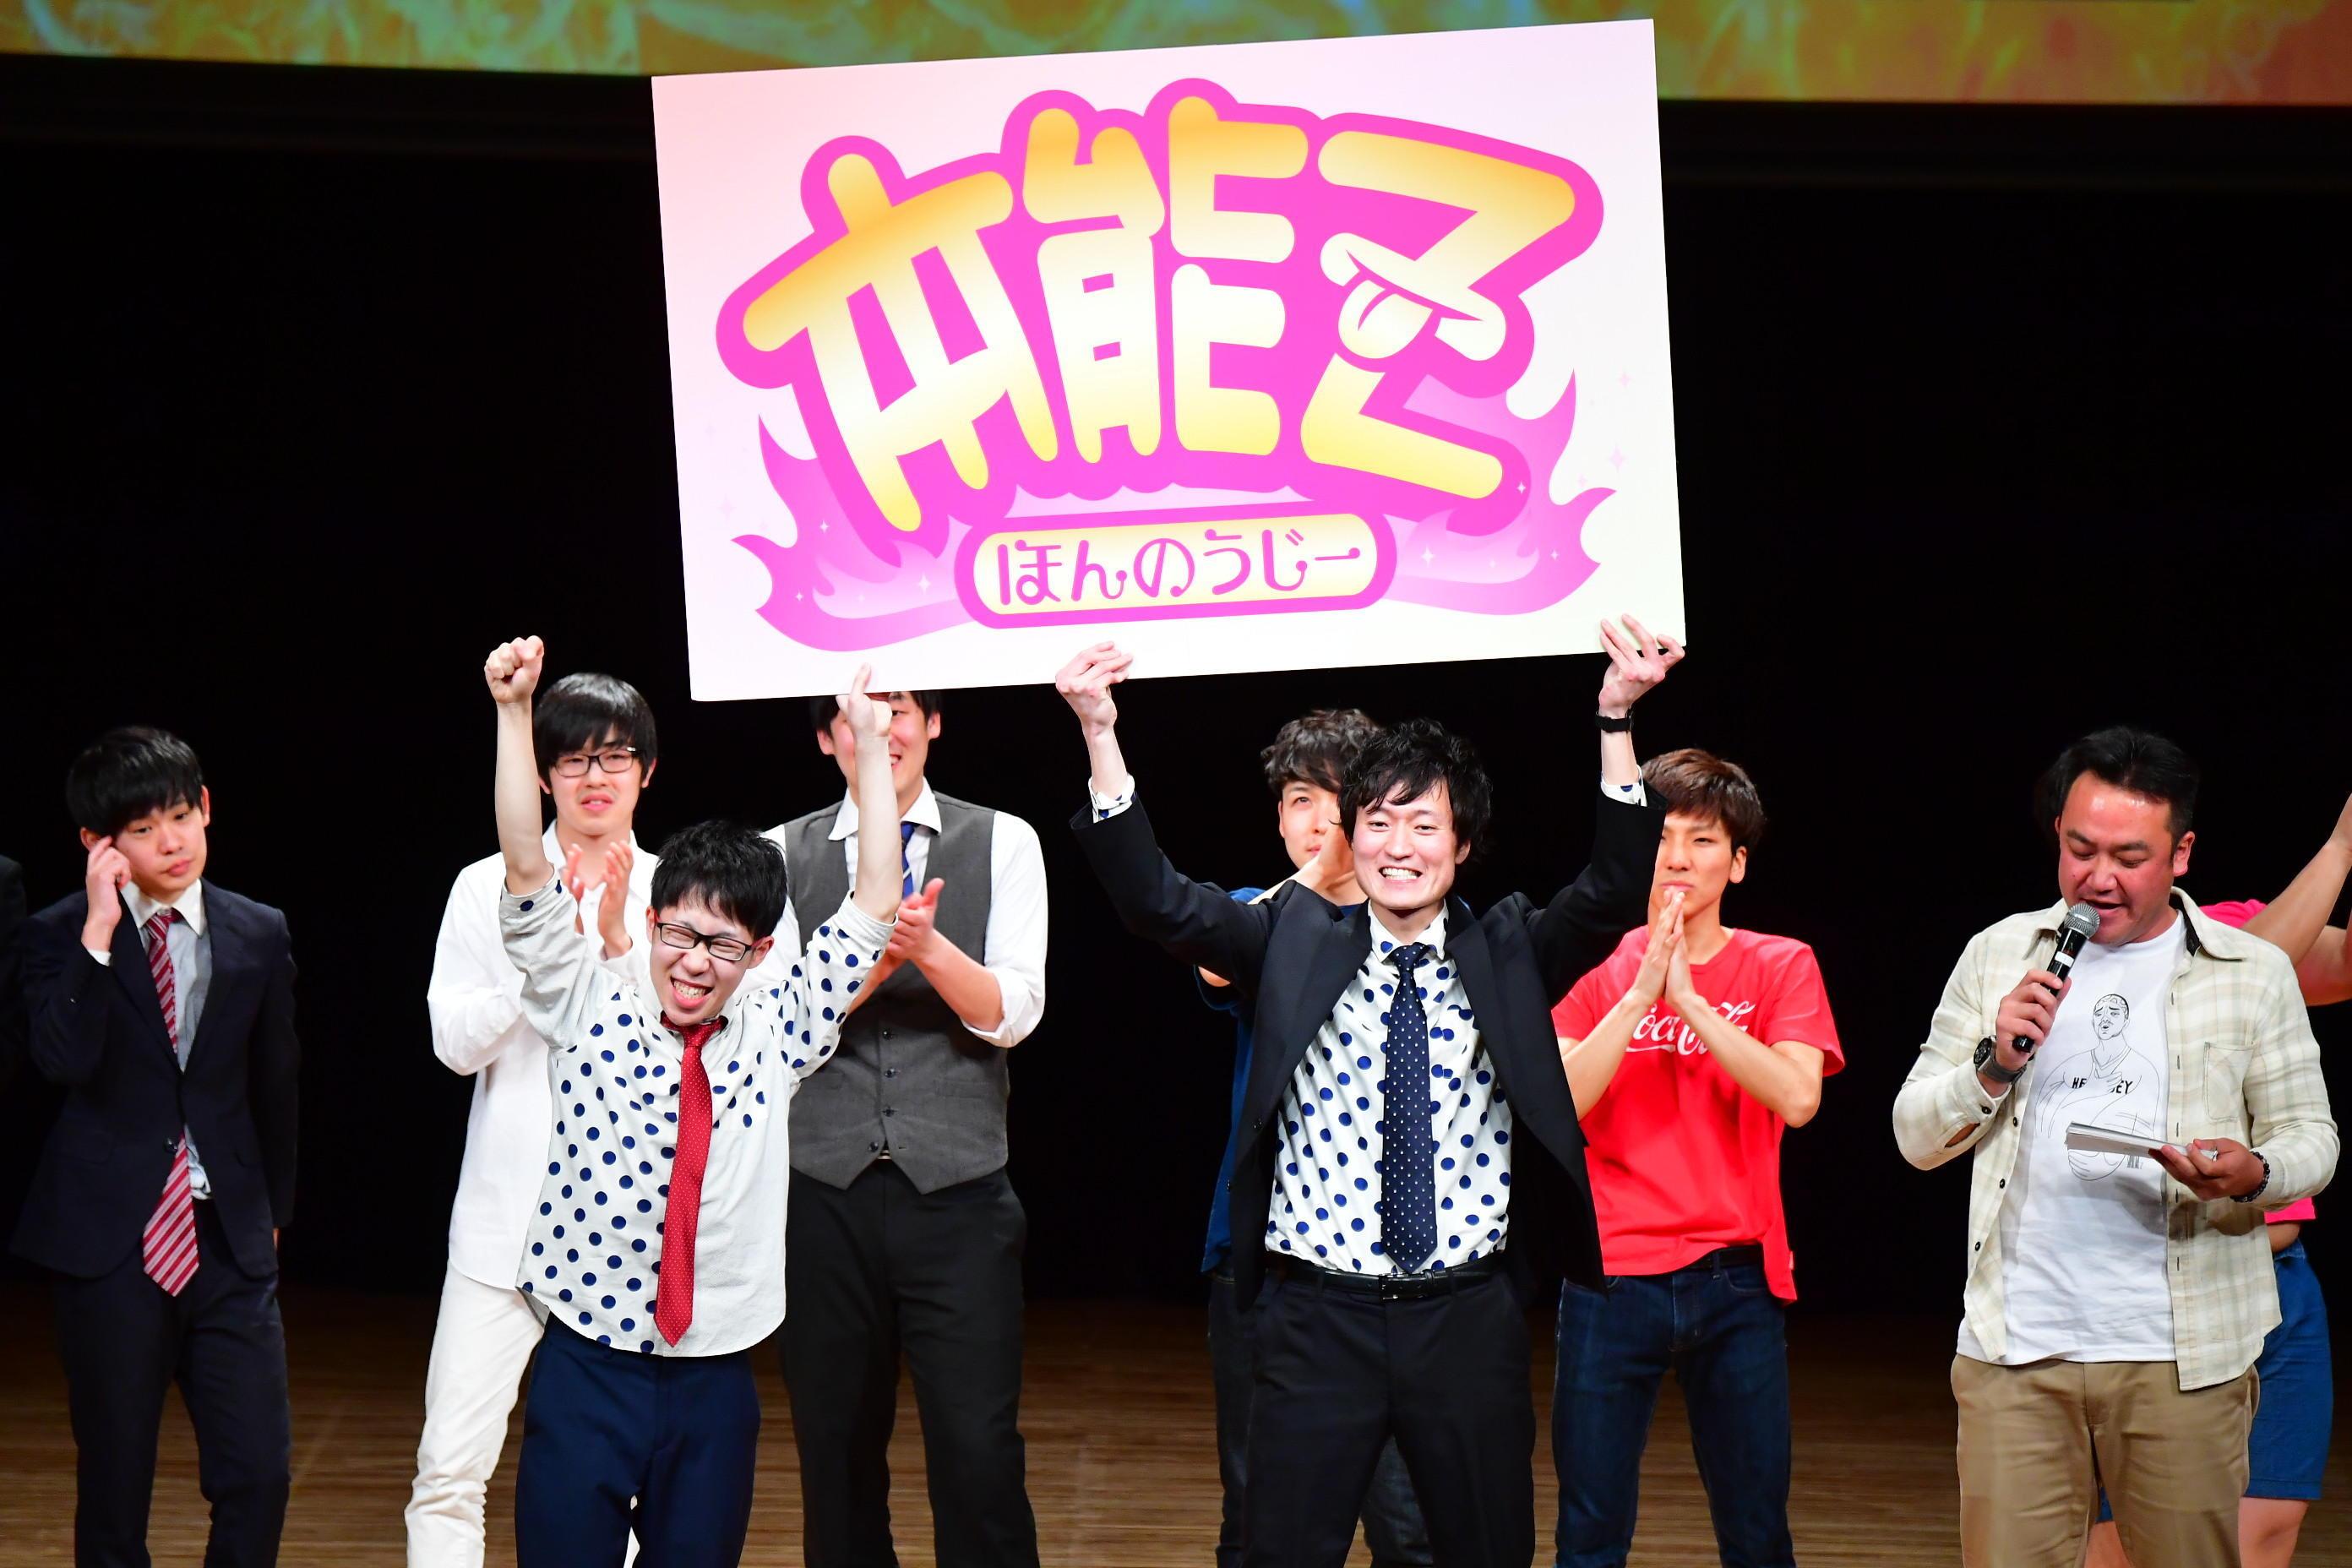 http://news.yoshimoto.co.jp/20180228001743-799ae1eb16bc80ddb26a4f961d25b11907b60e56.jpg